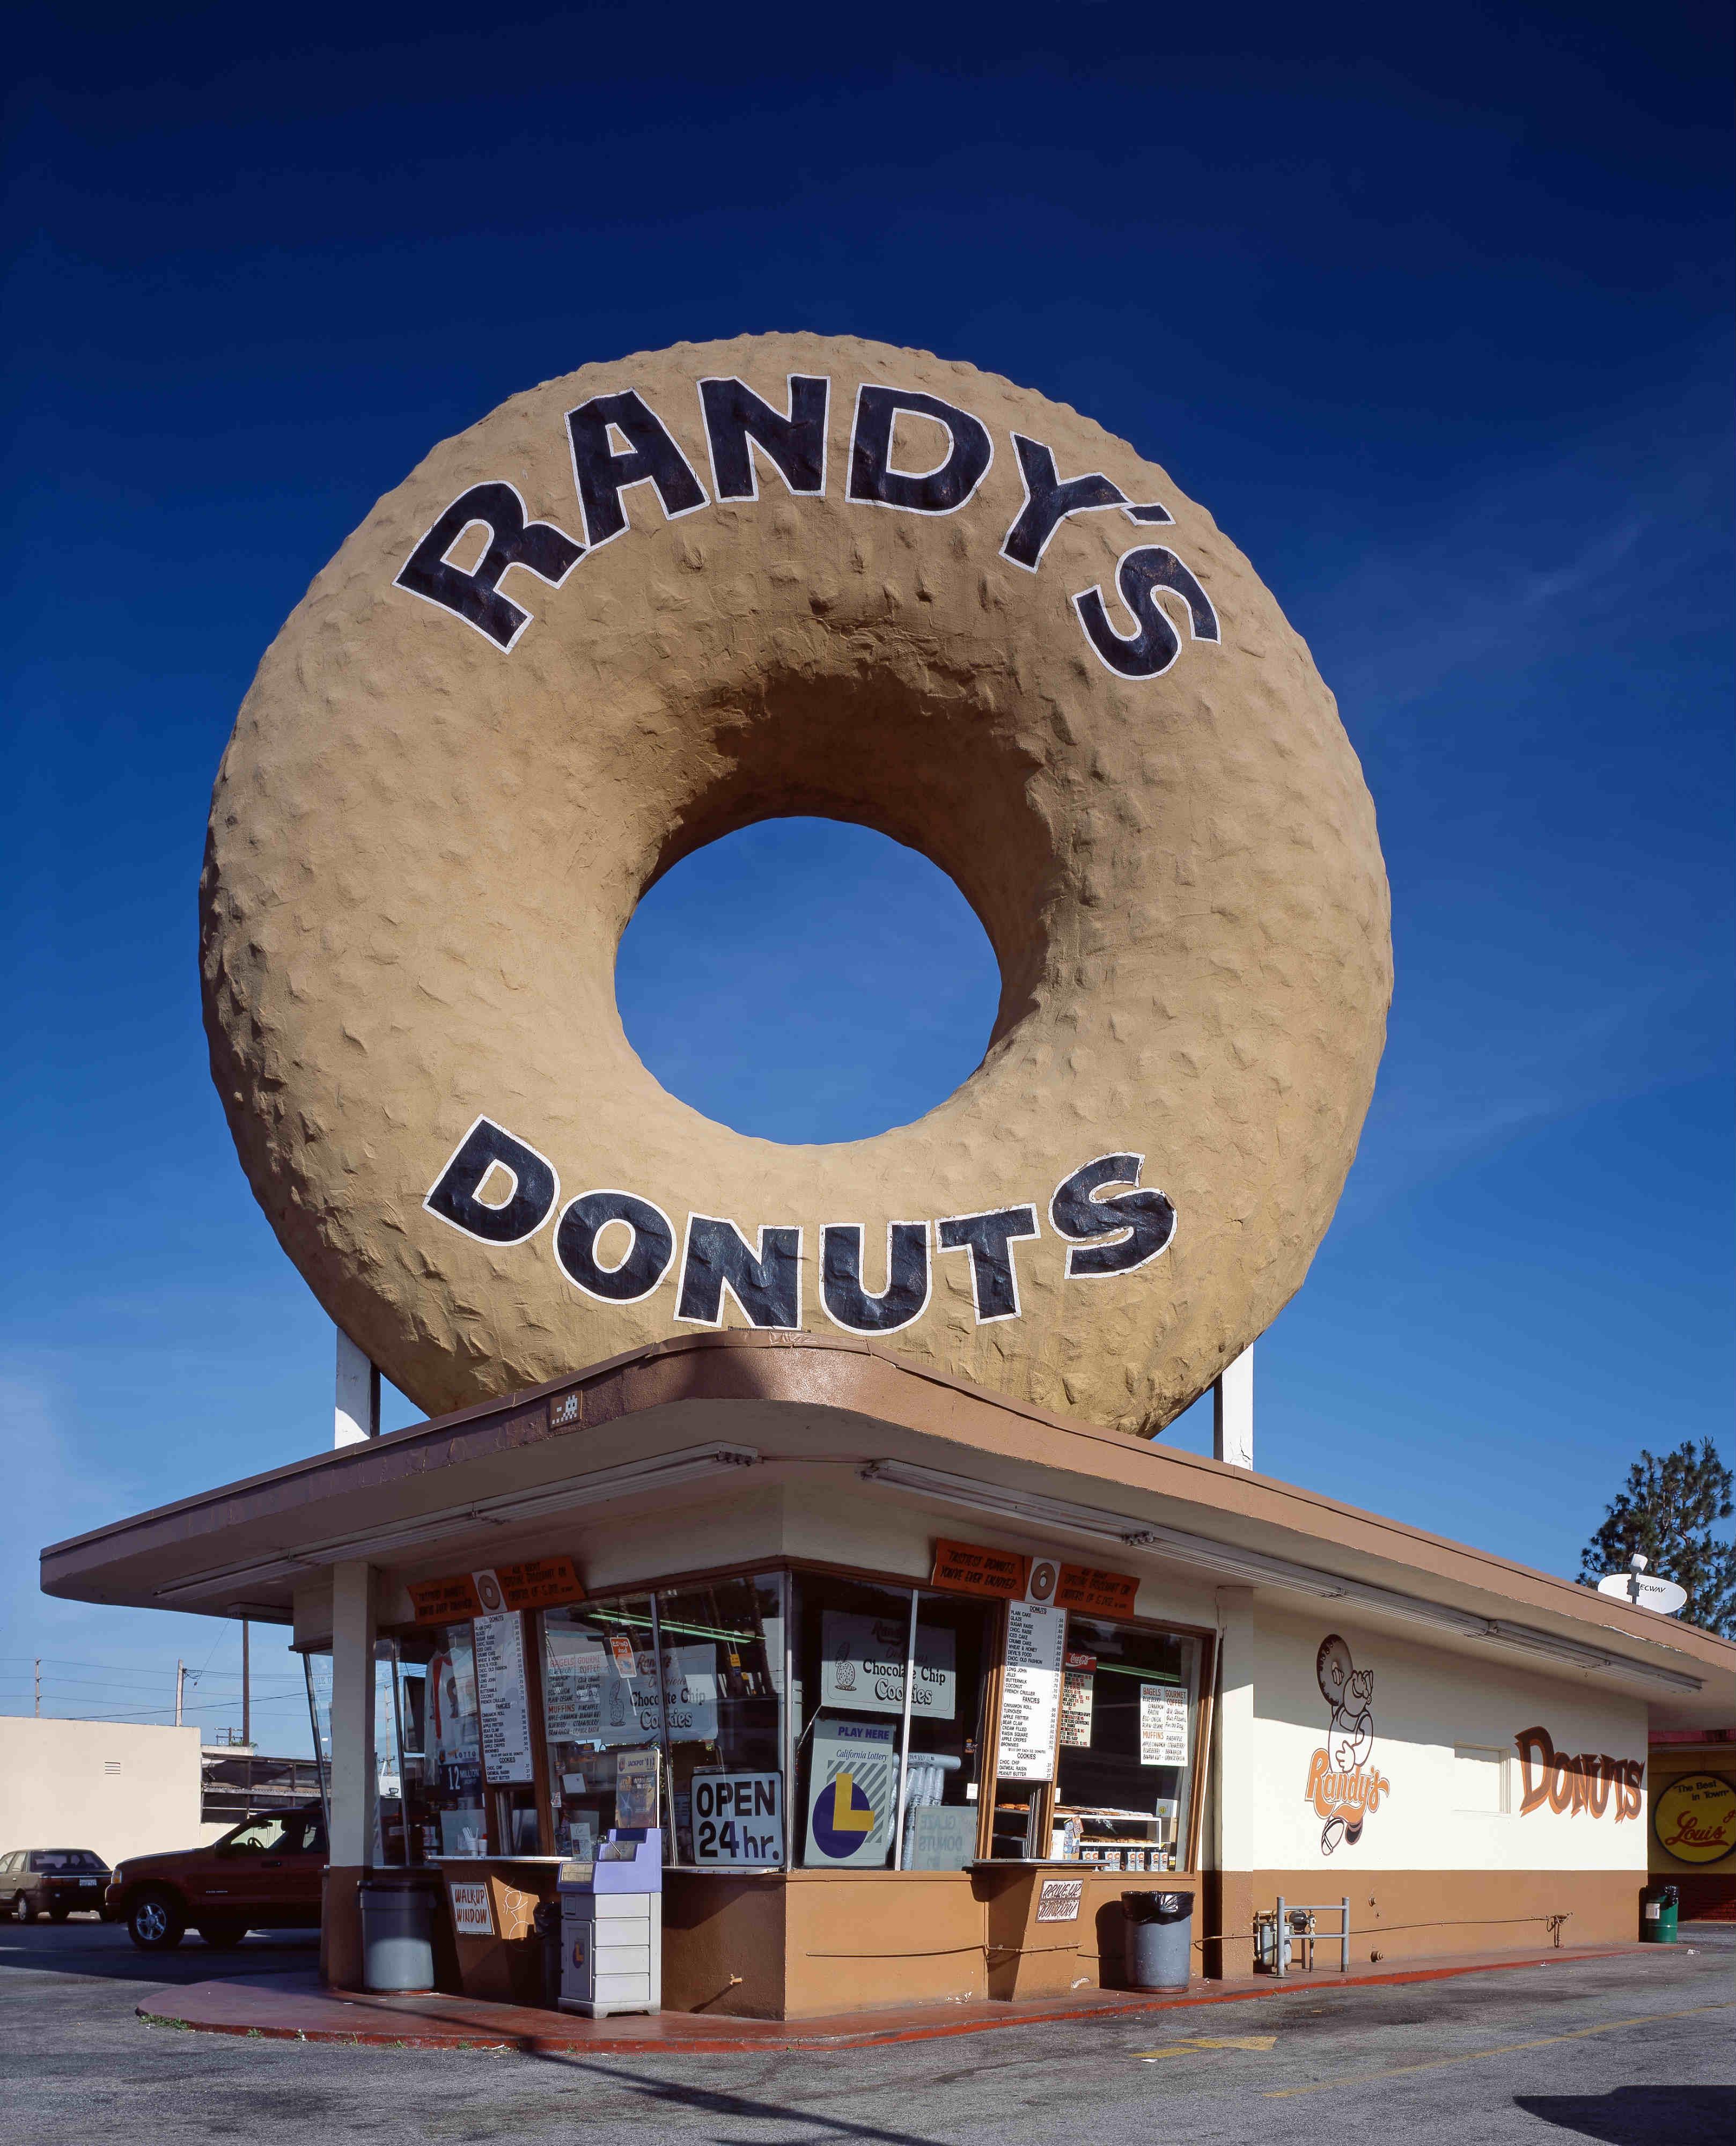 Randy's_donuts1_edit1